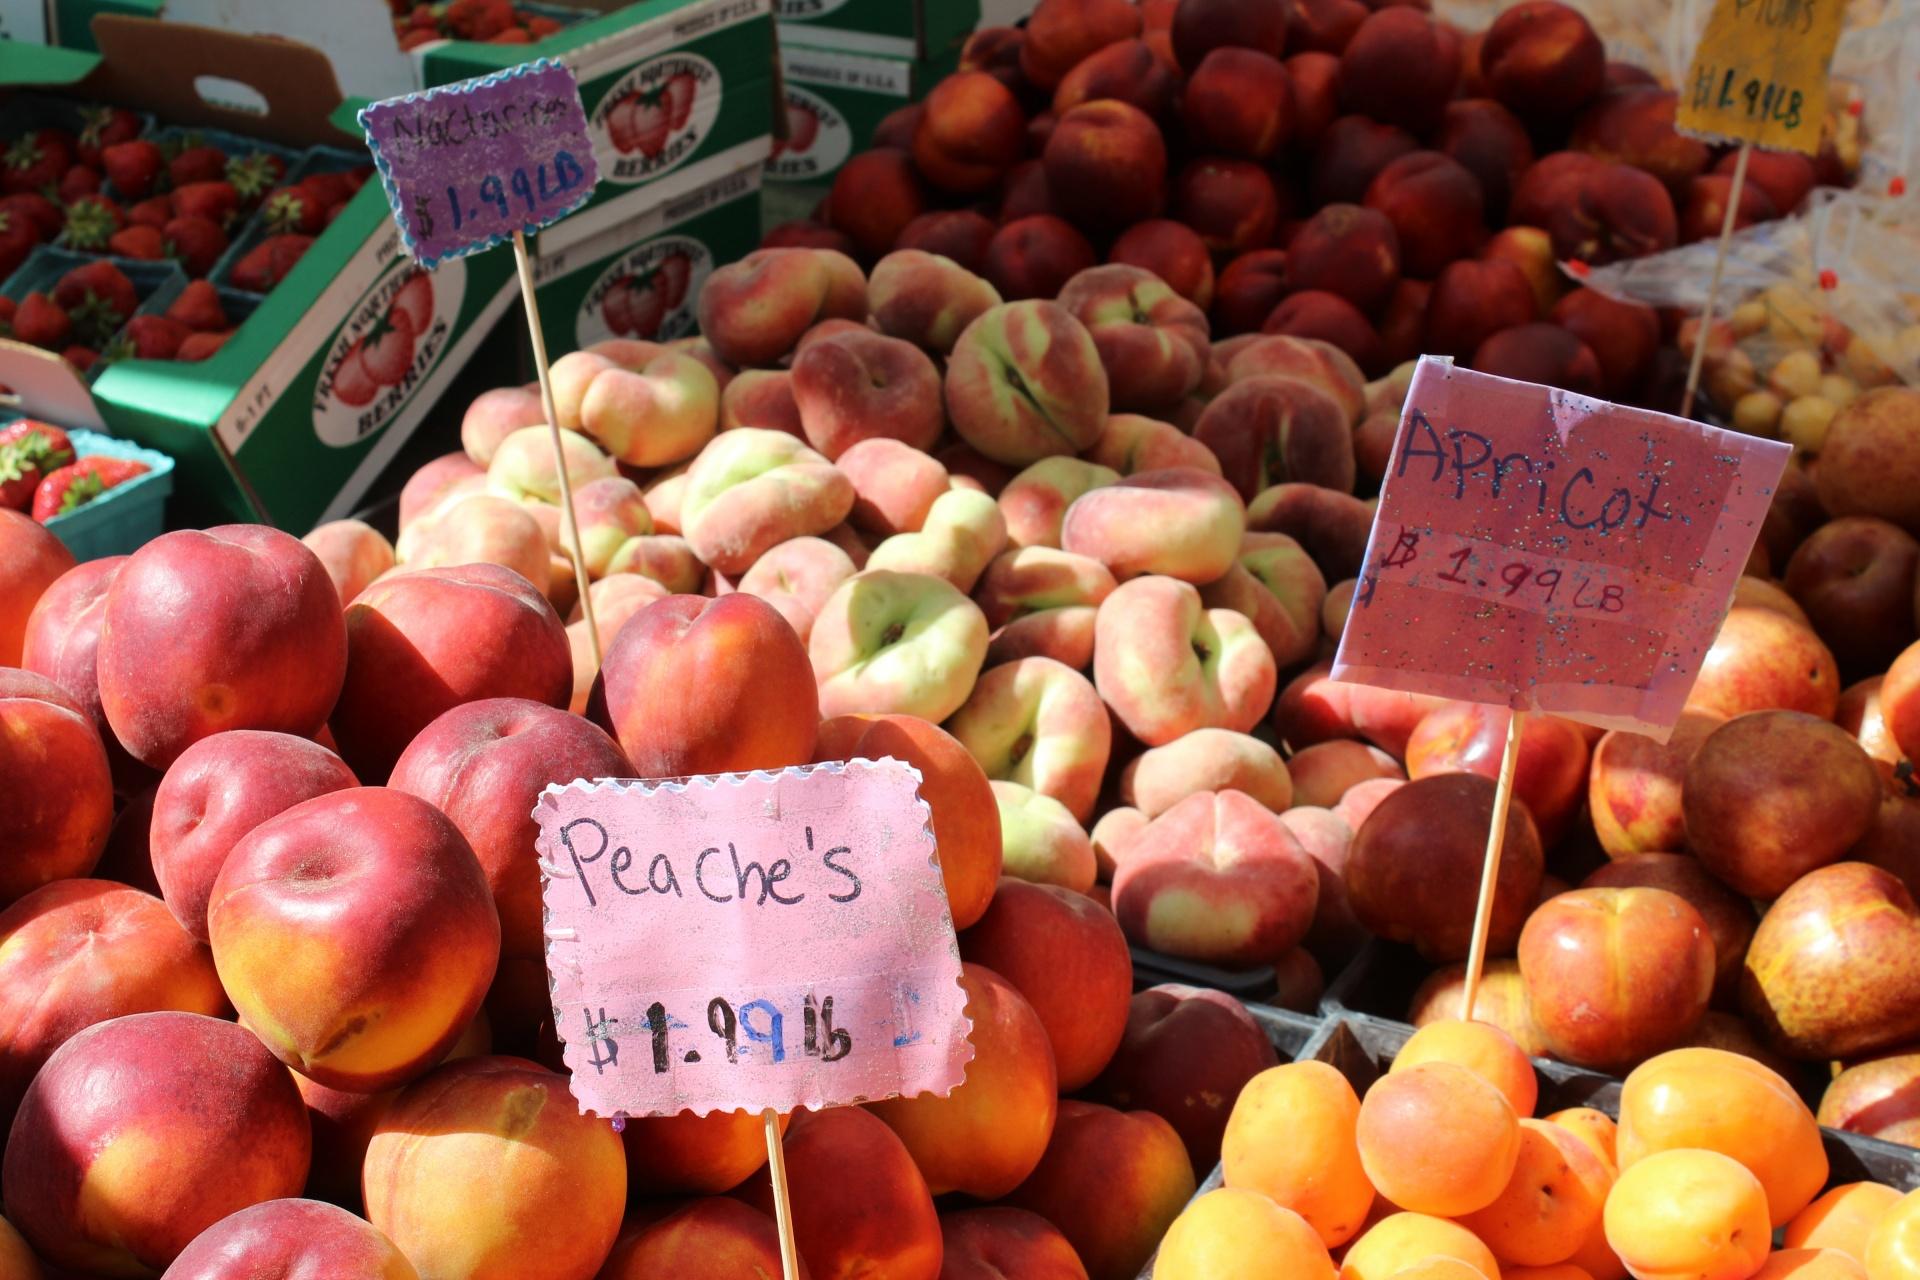 Apricots Peaches Fresh Farmers Nbsp Market Background Free